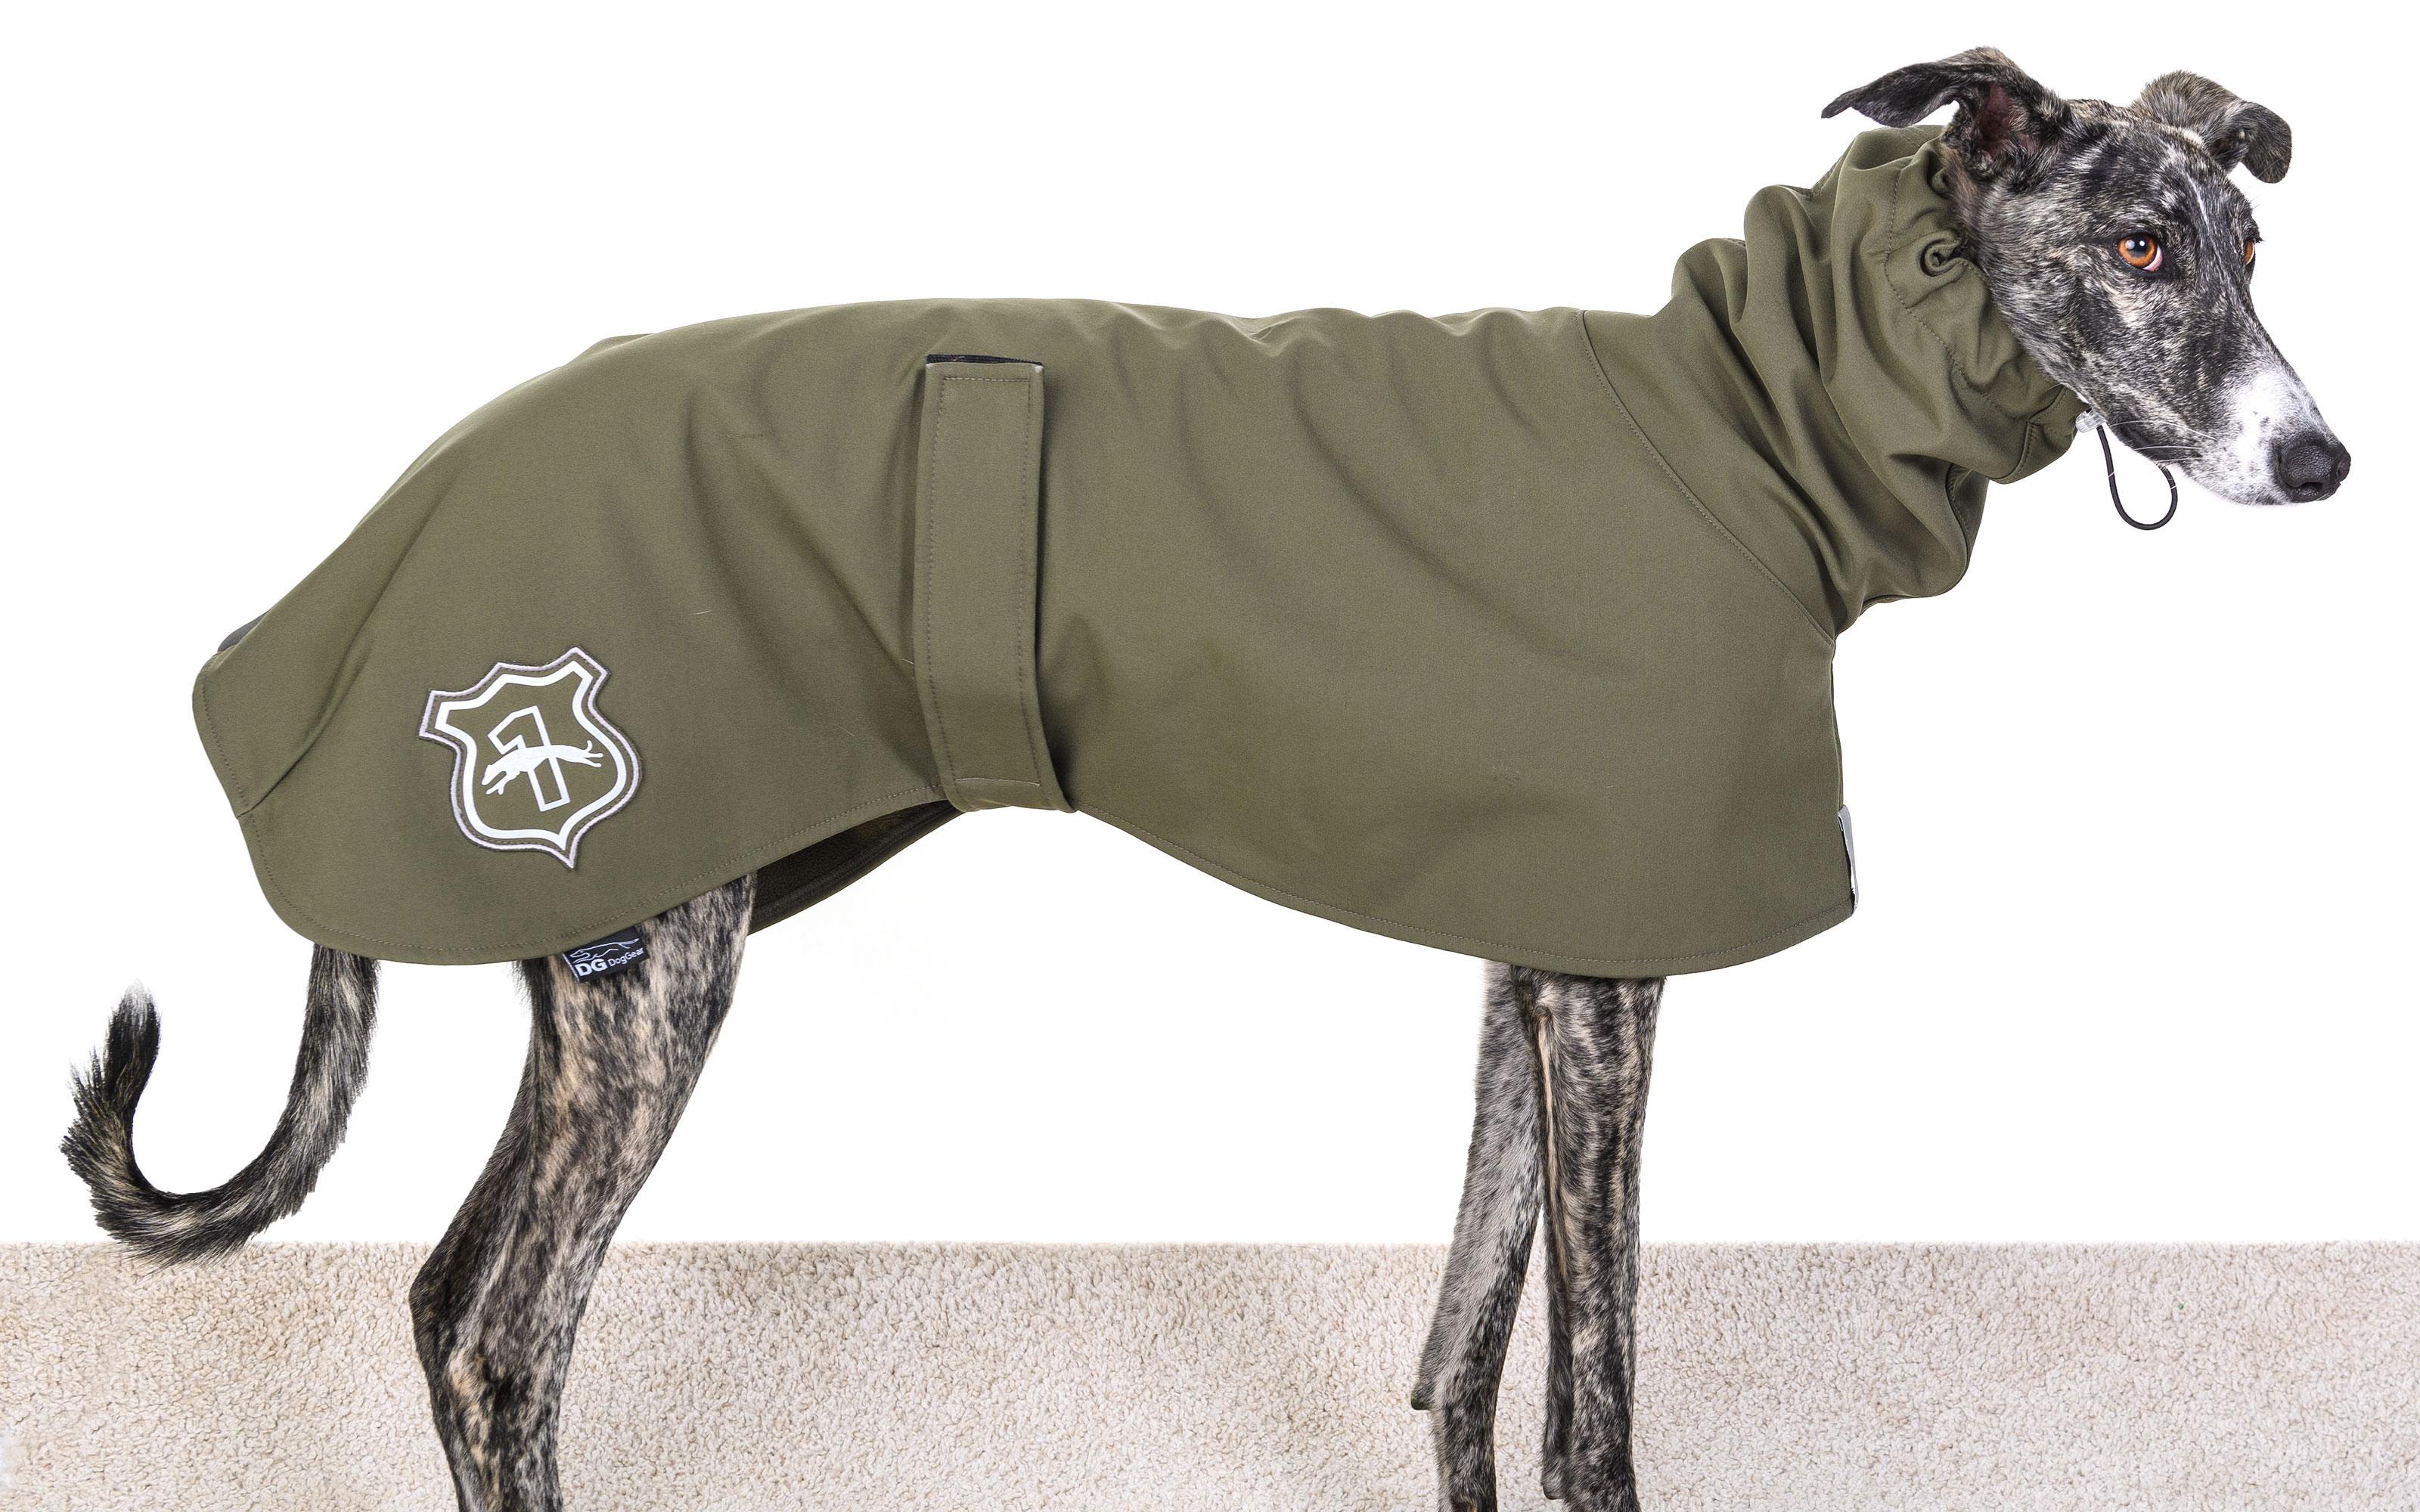 Windhundbekleidung DG DogGear